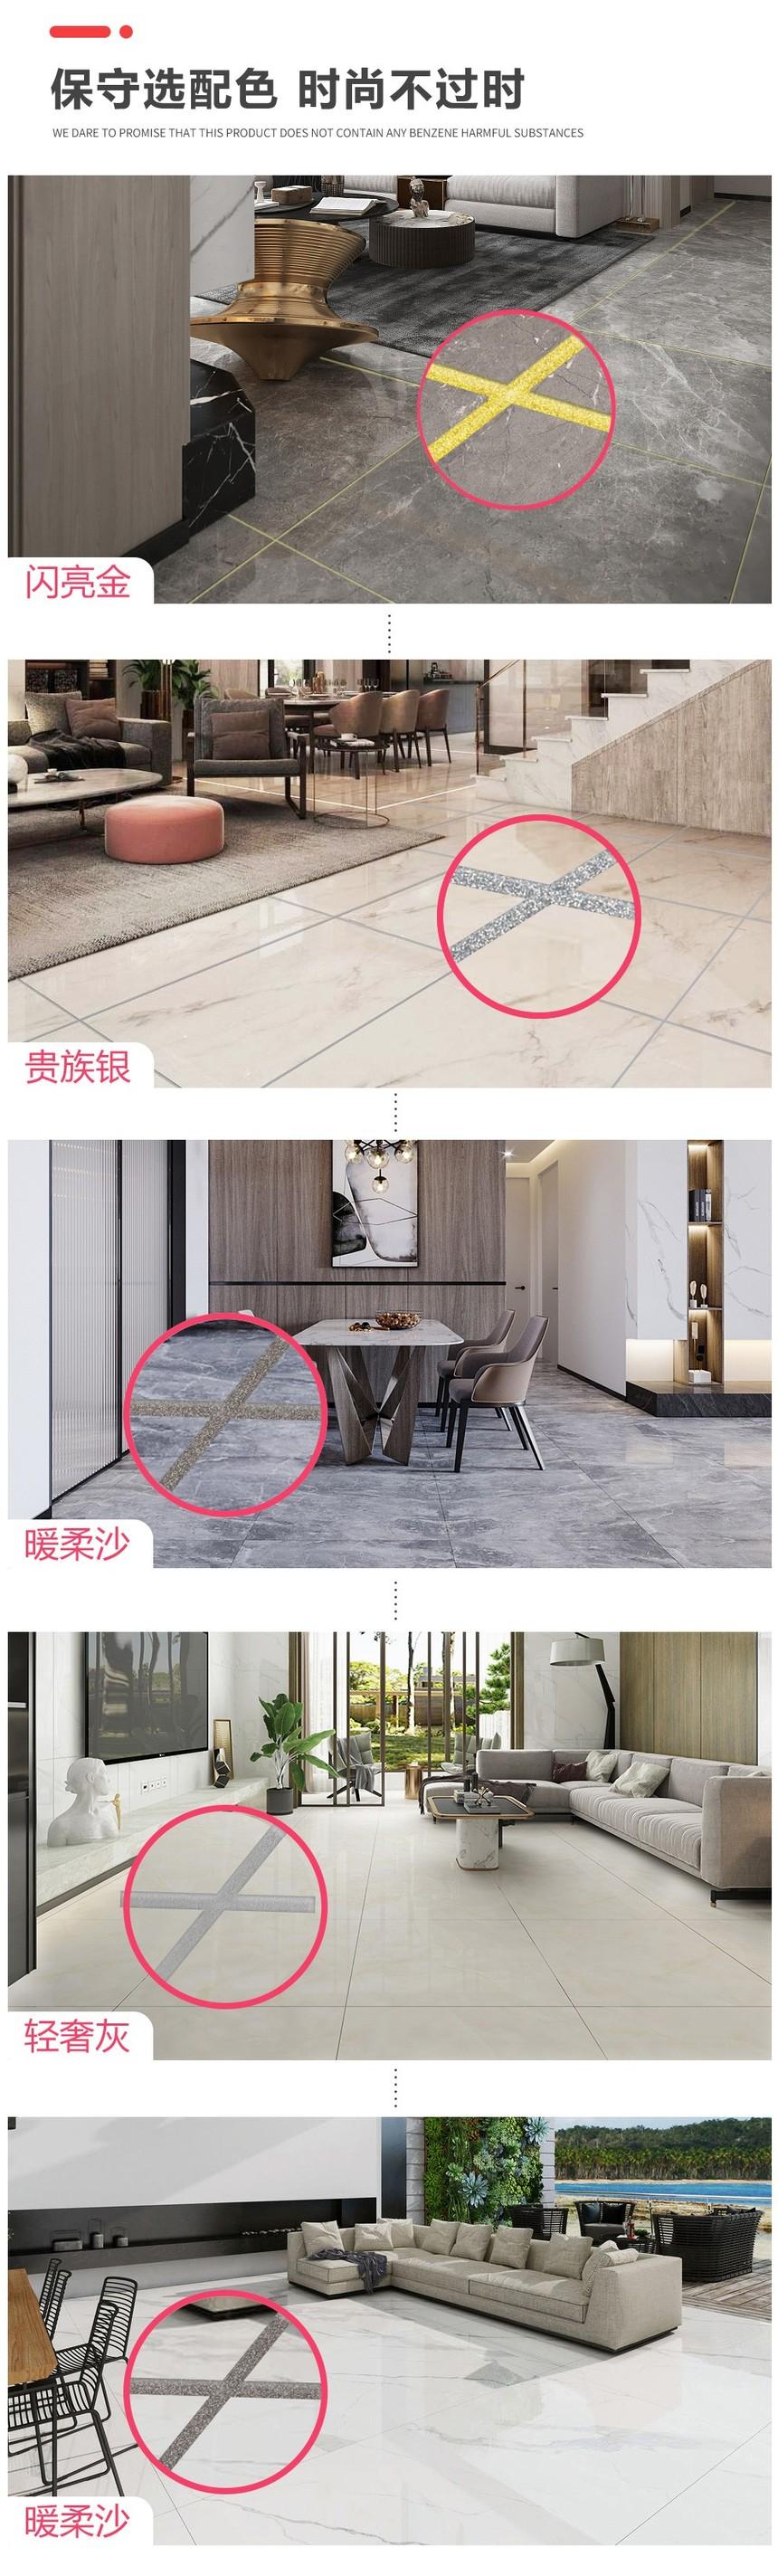 DIY美縫詳情頁-0603-定稿(1)_11.jpg